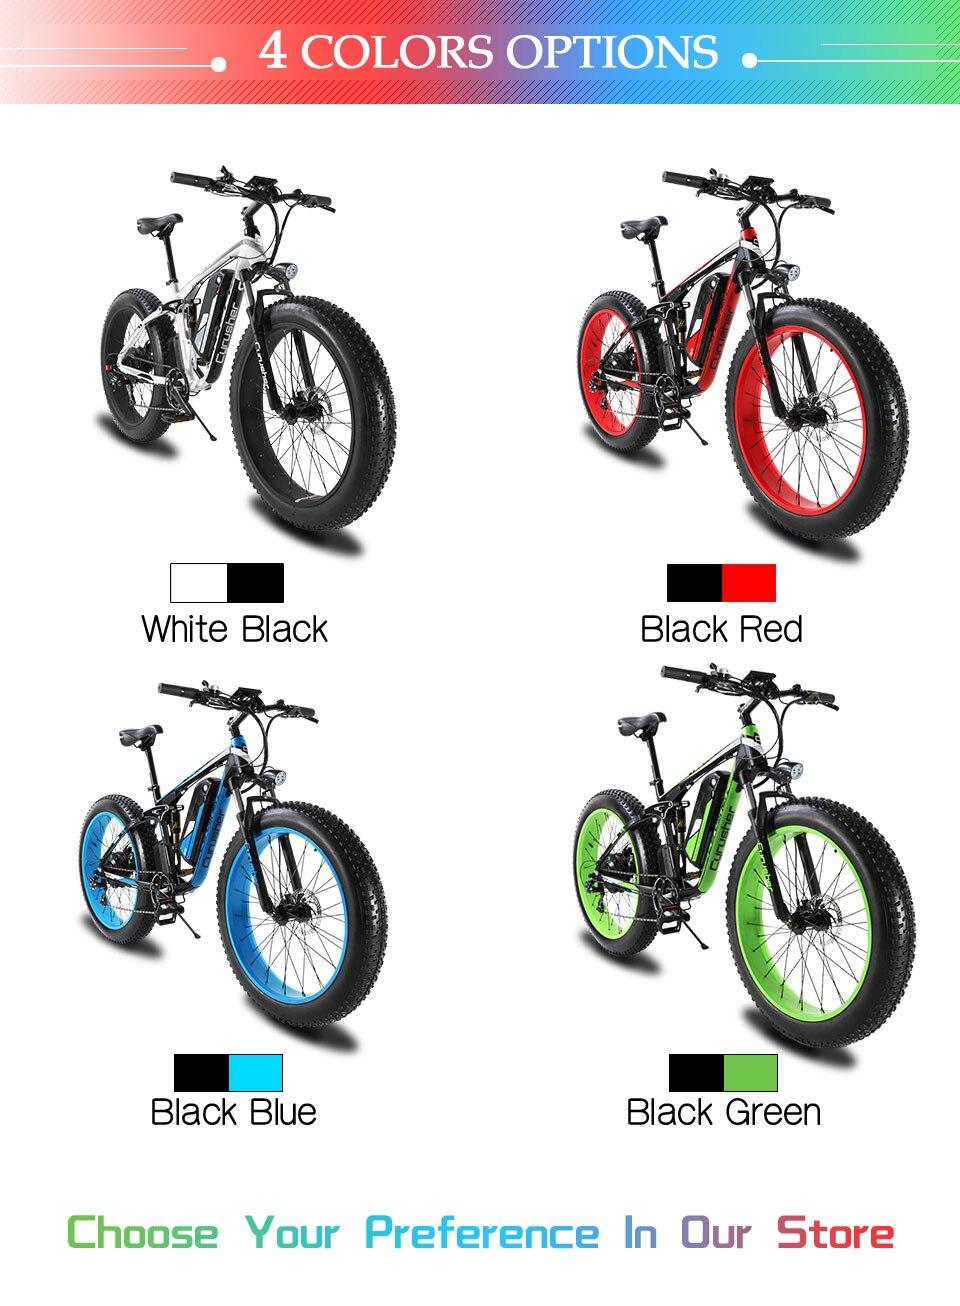 HTB1Ns7LM7voK1RjSZFwq6AiCFXaN - Cyrusher XF800 1000W 48V Electrical Bike Full Suspension body 7 Speeds widewheel highway Bike out of doors sensible speedometer Ebike